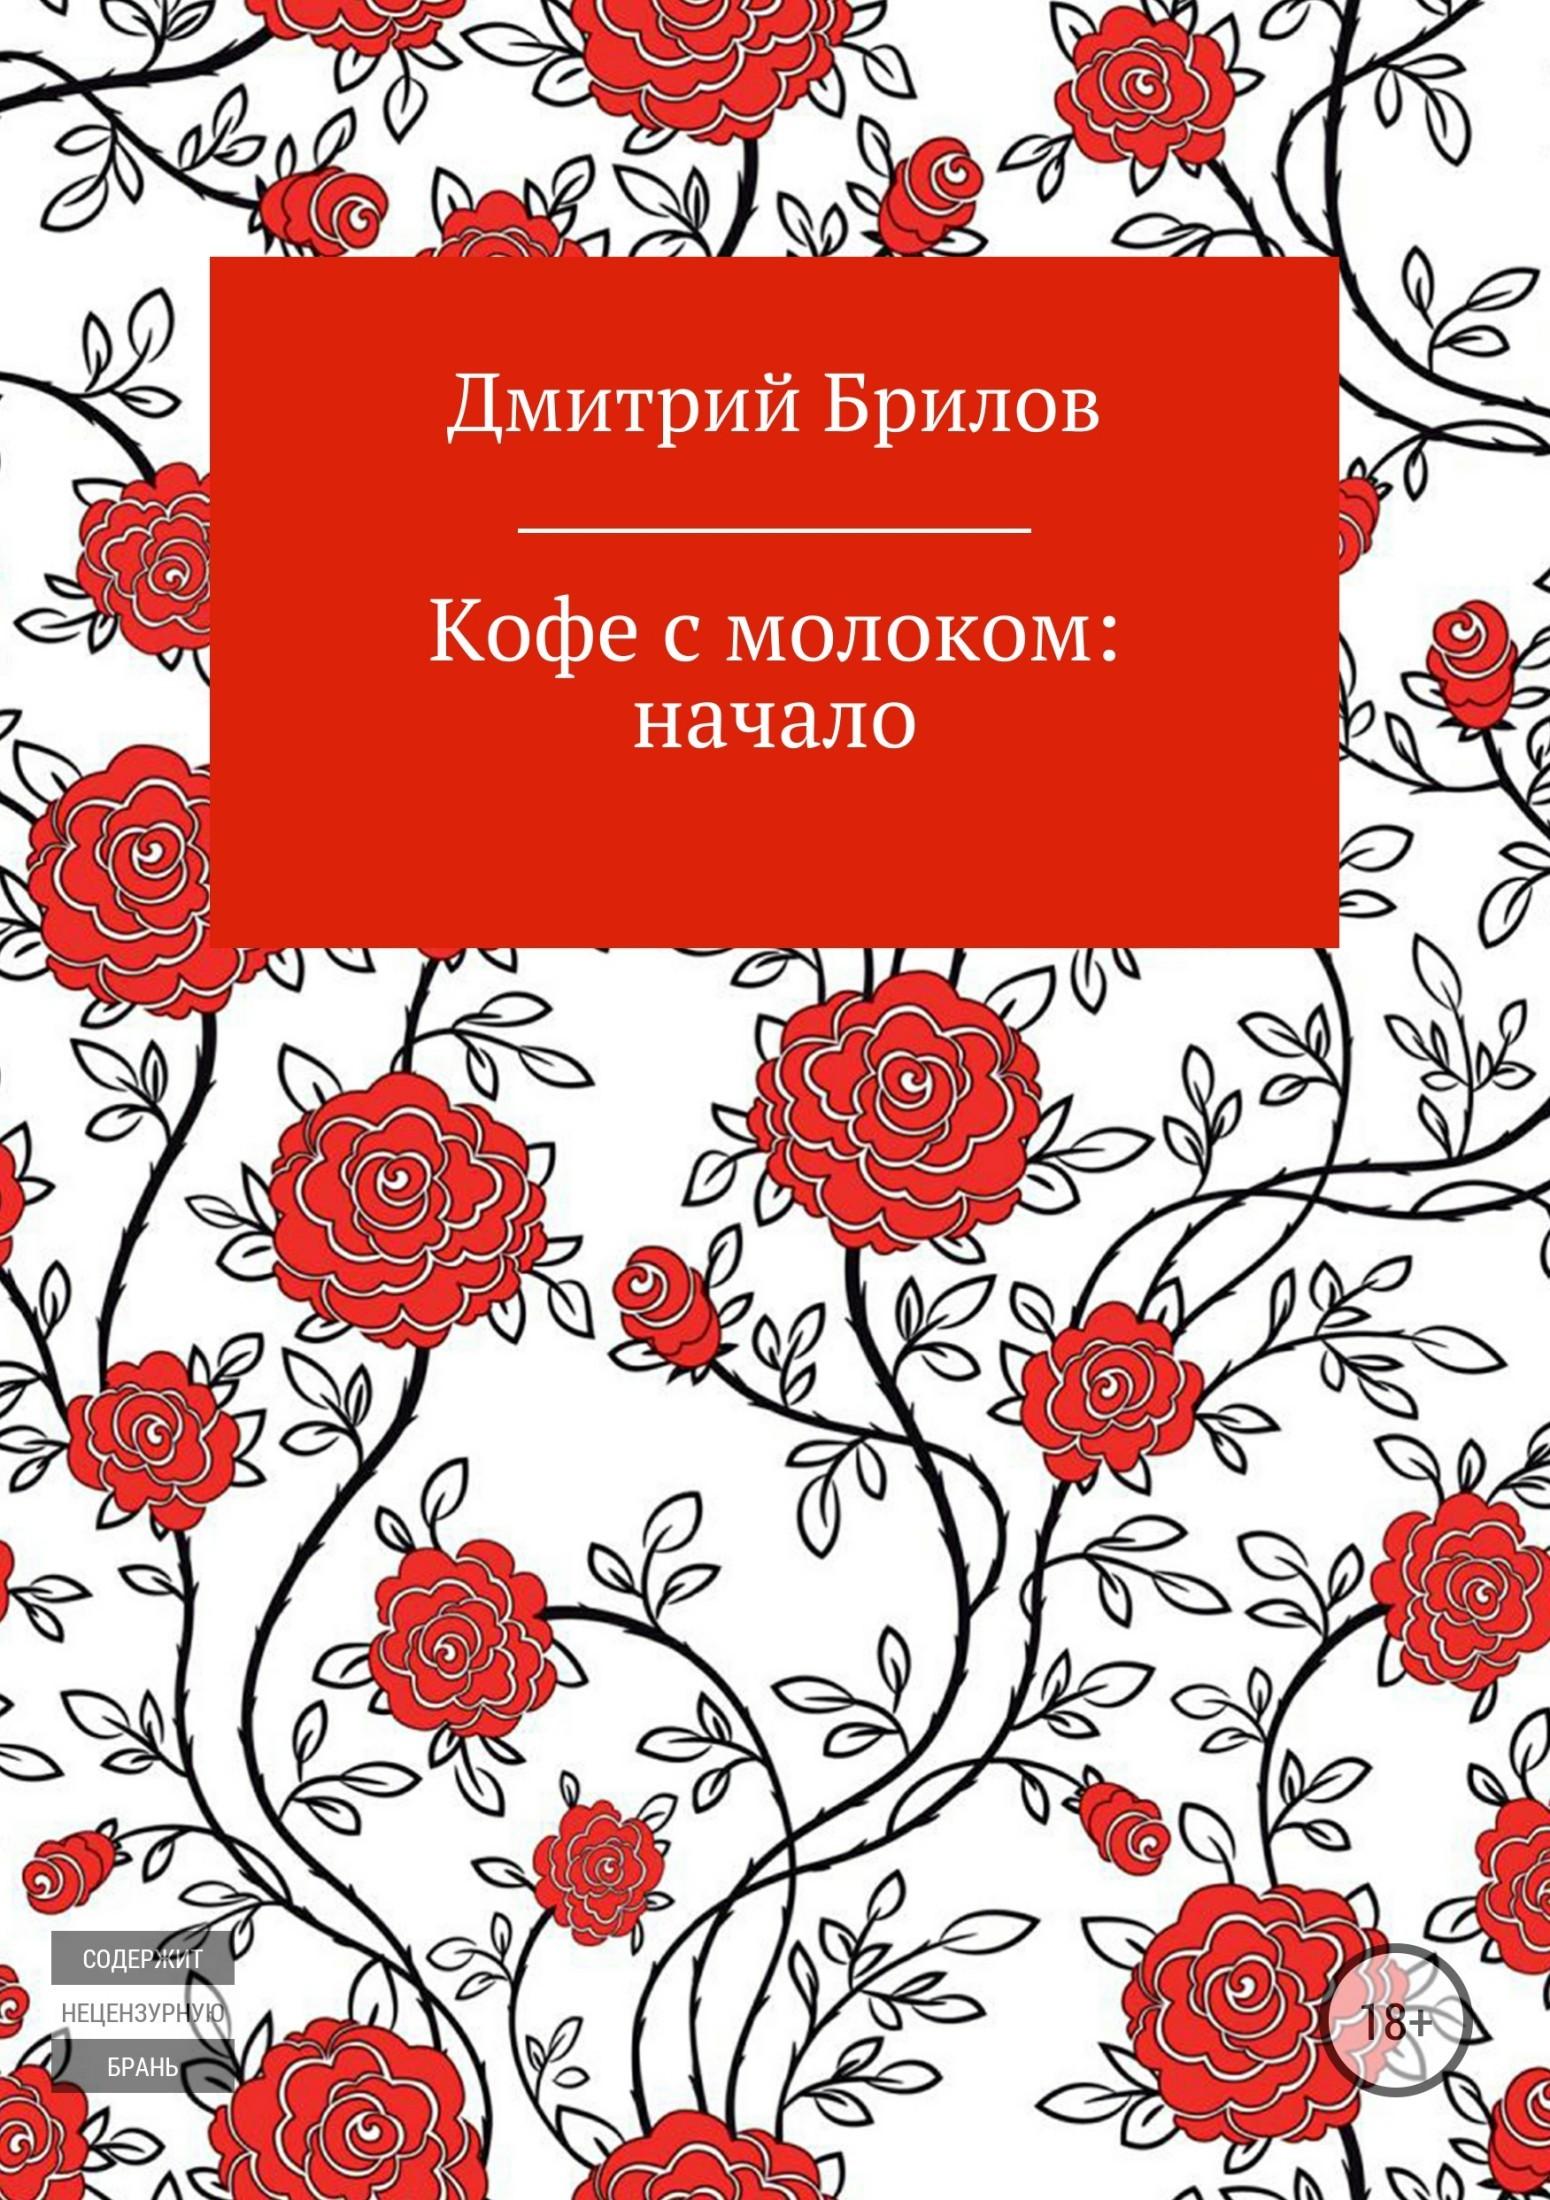 Дмитрий Брилов Кофе с молоком: начало дмитрий брилов кофе с молоком начало